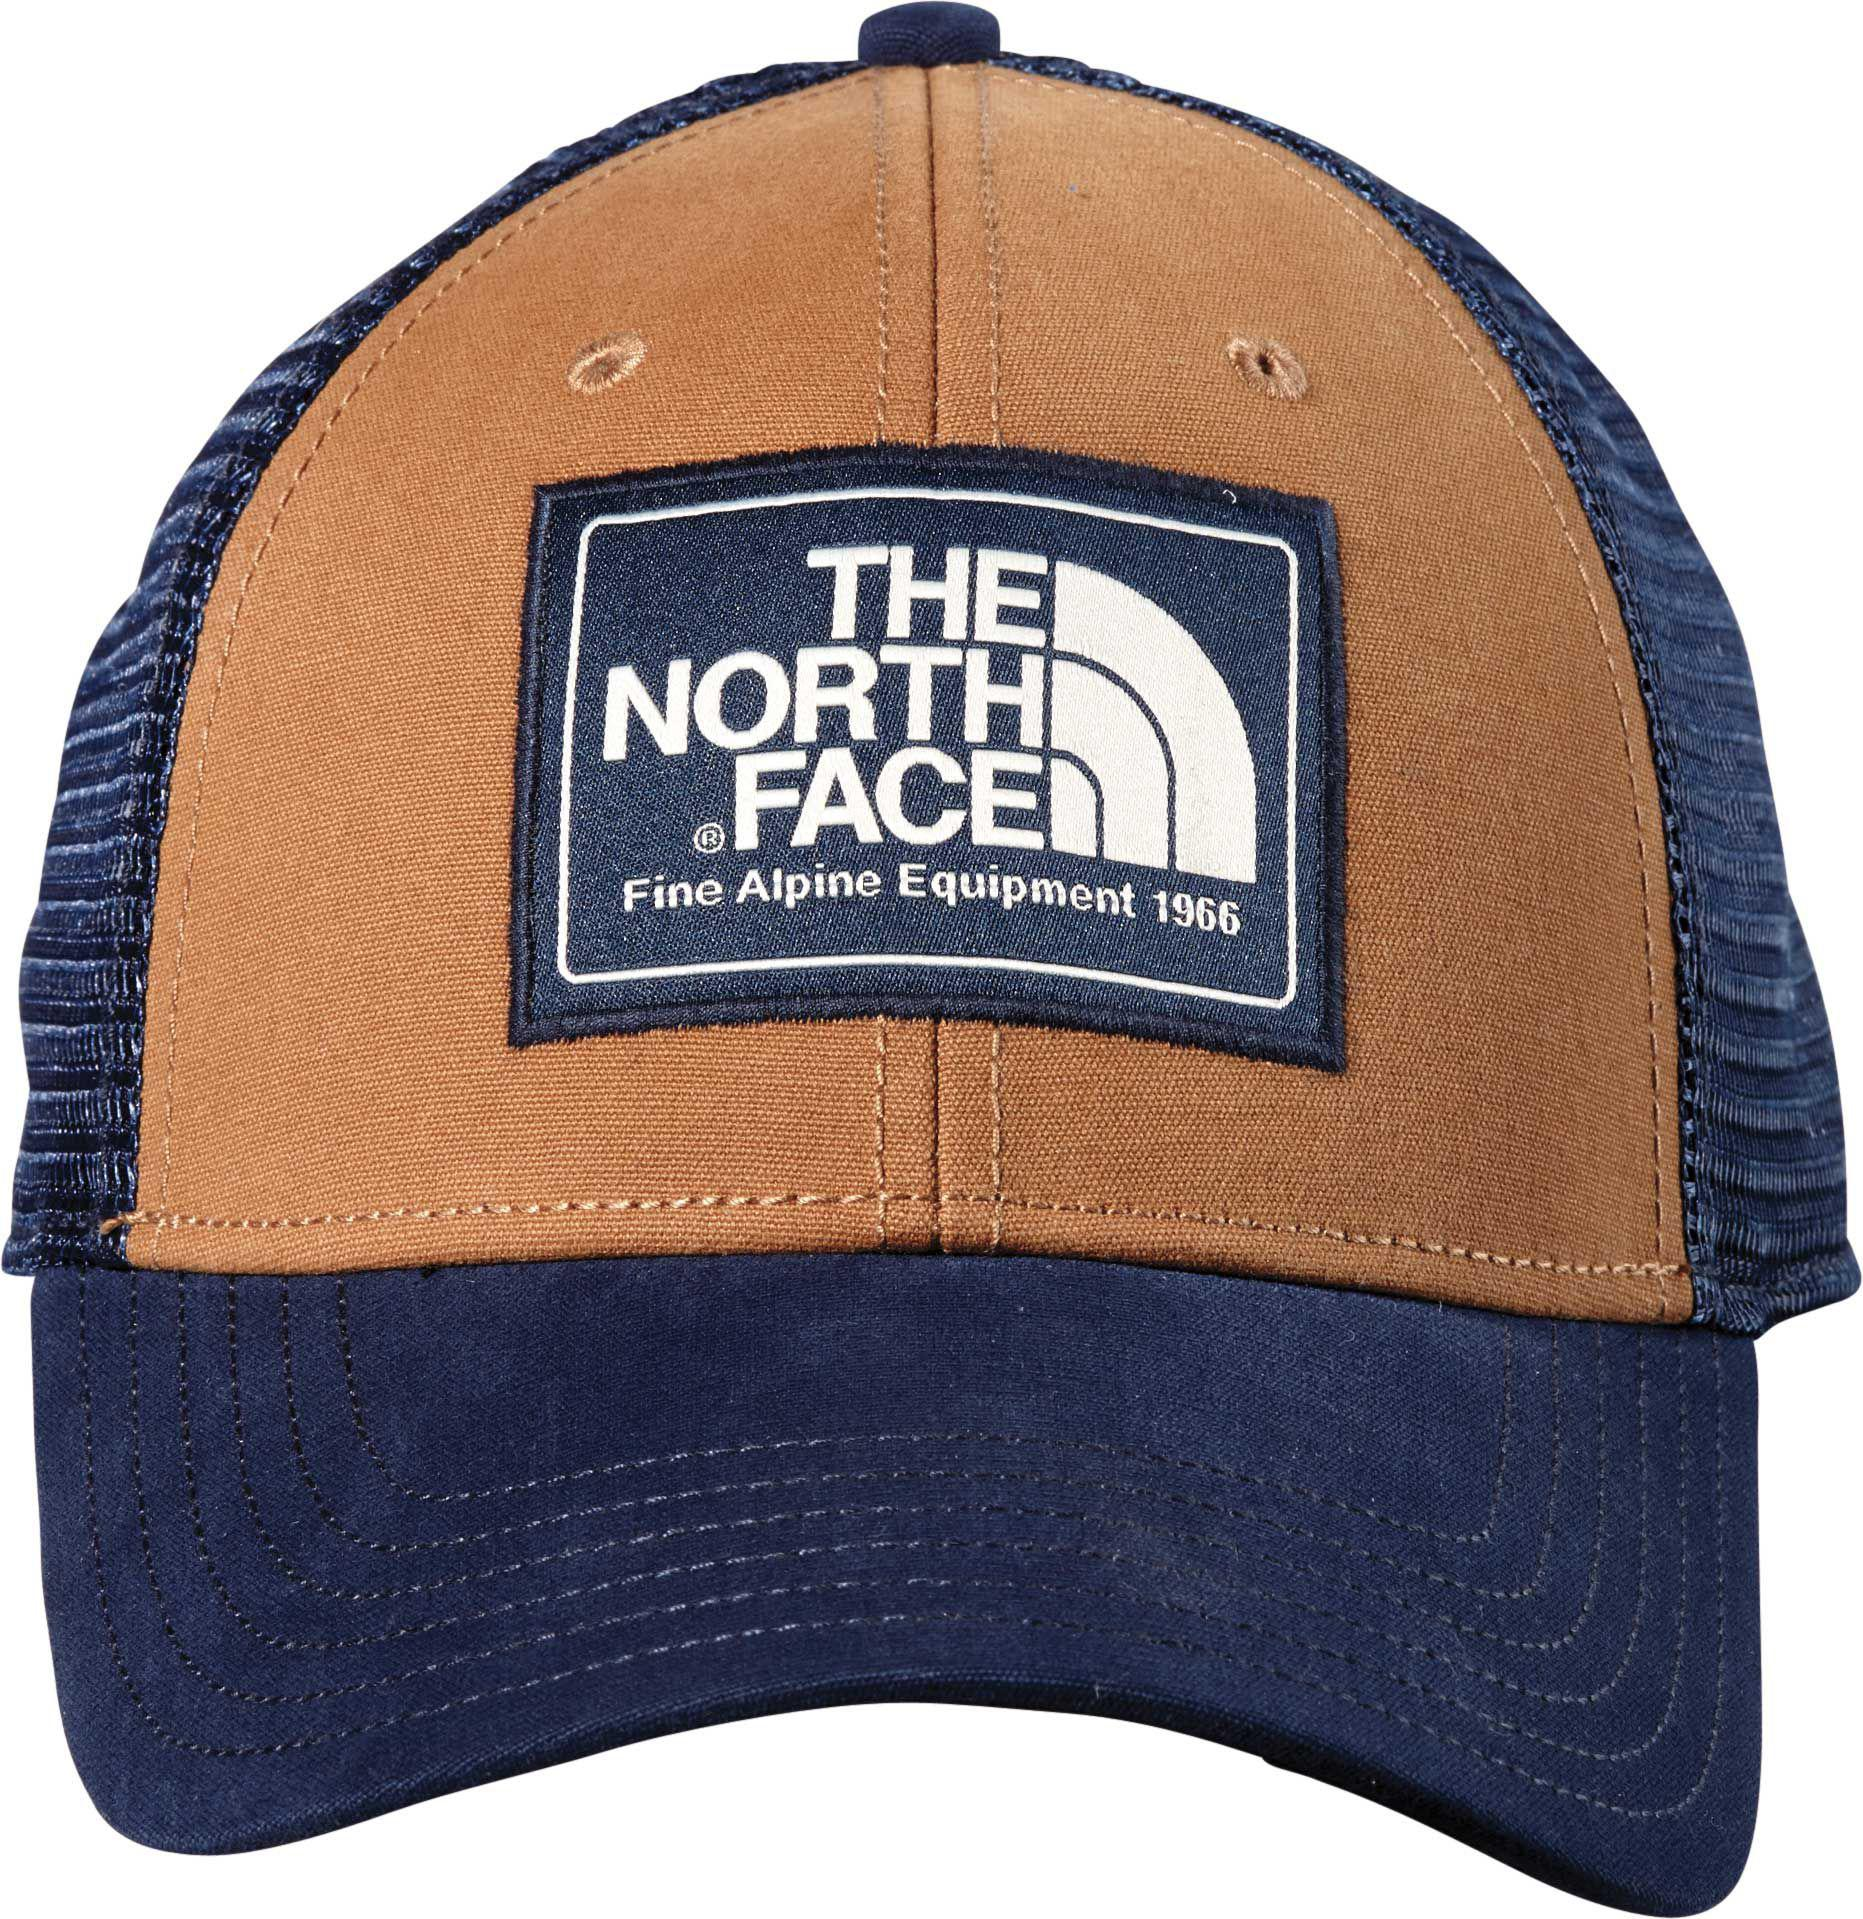 Lyst the north face mudder trucker hat in blue for men jpg 1863x1919 Trucker  tan face 3fe724725032